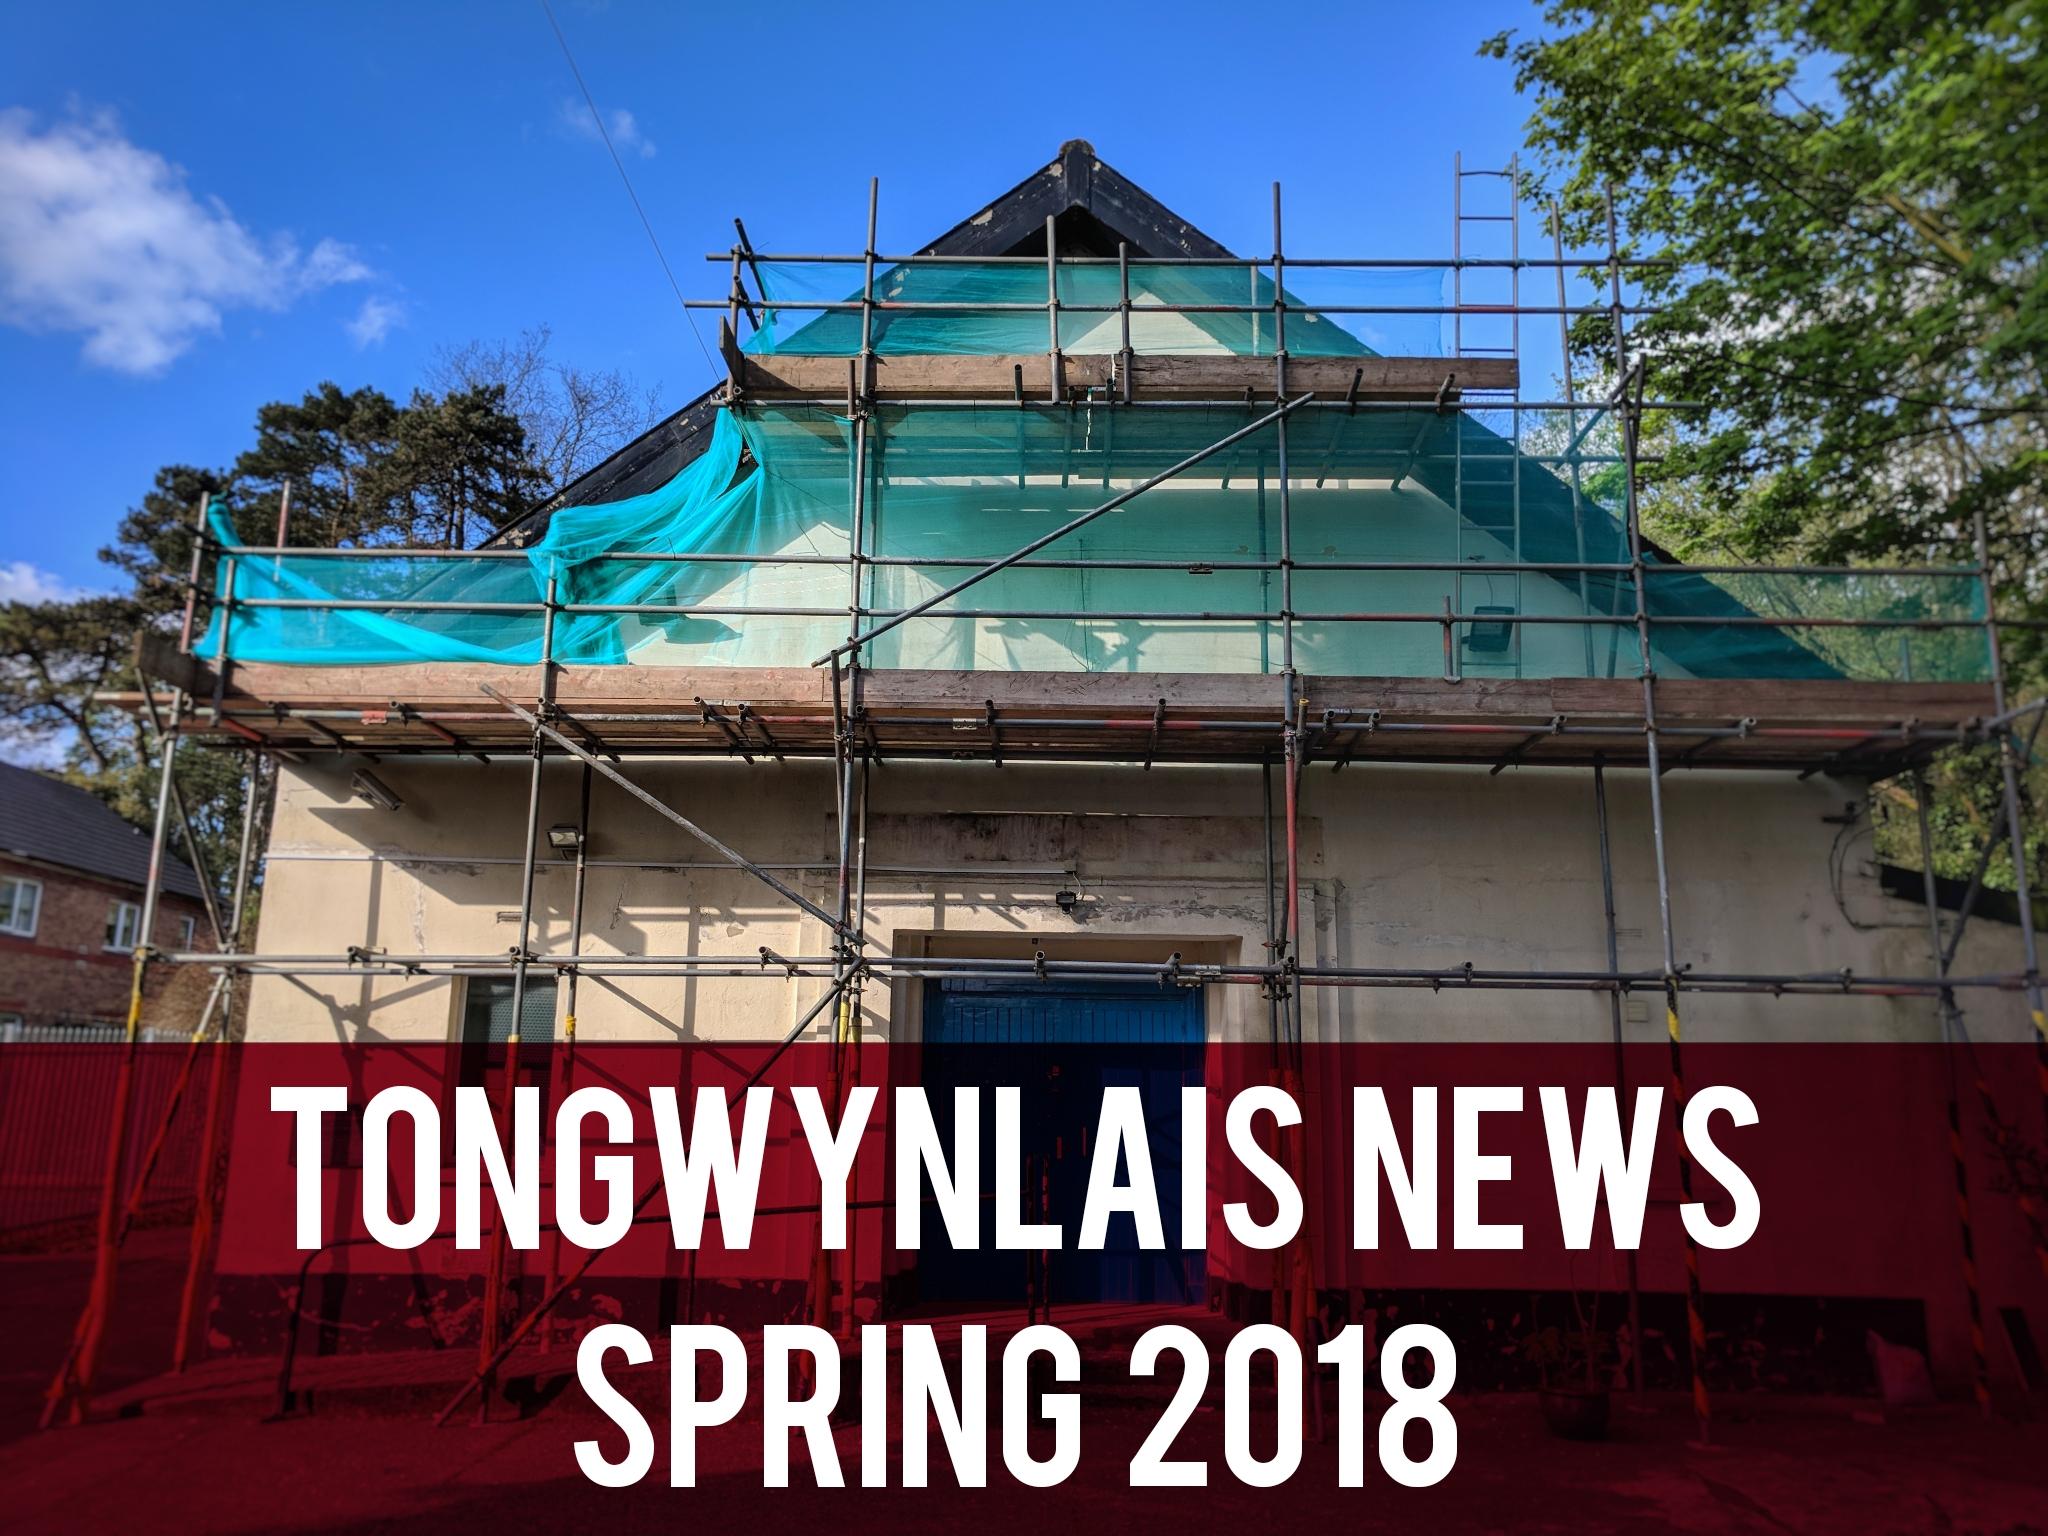 Tongwynlais News Spring 2018 header